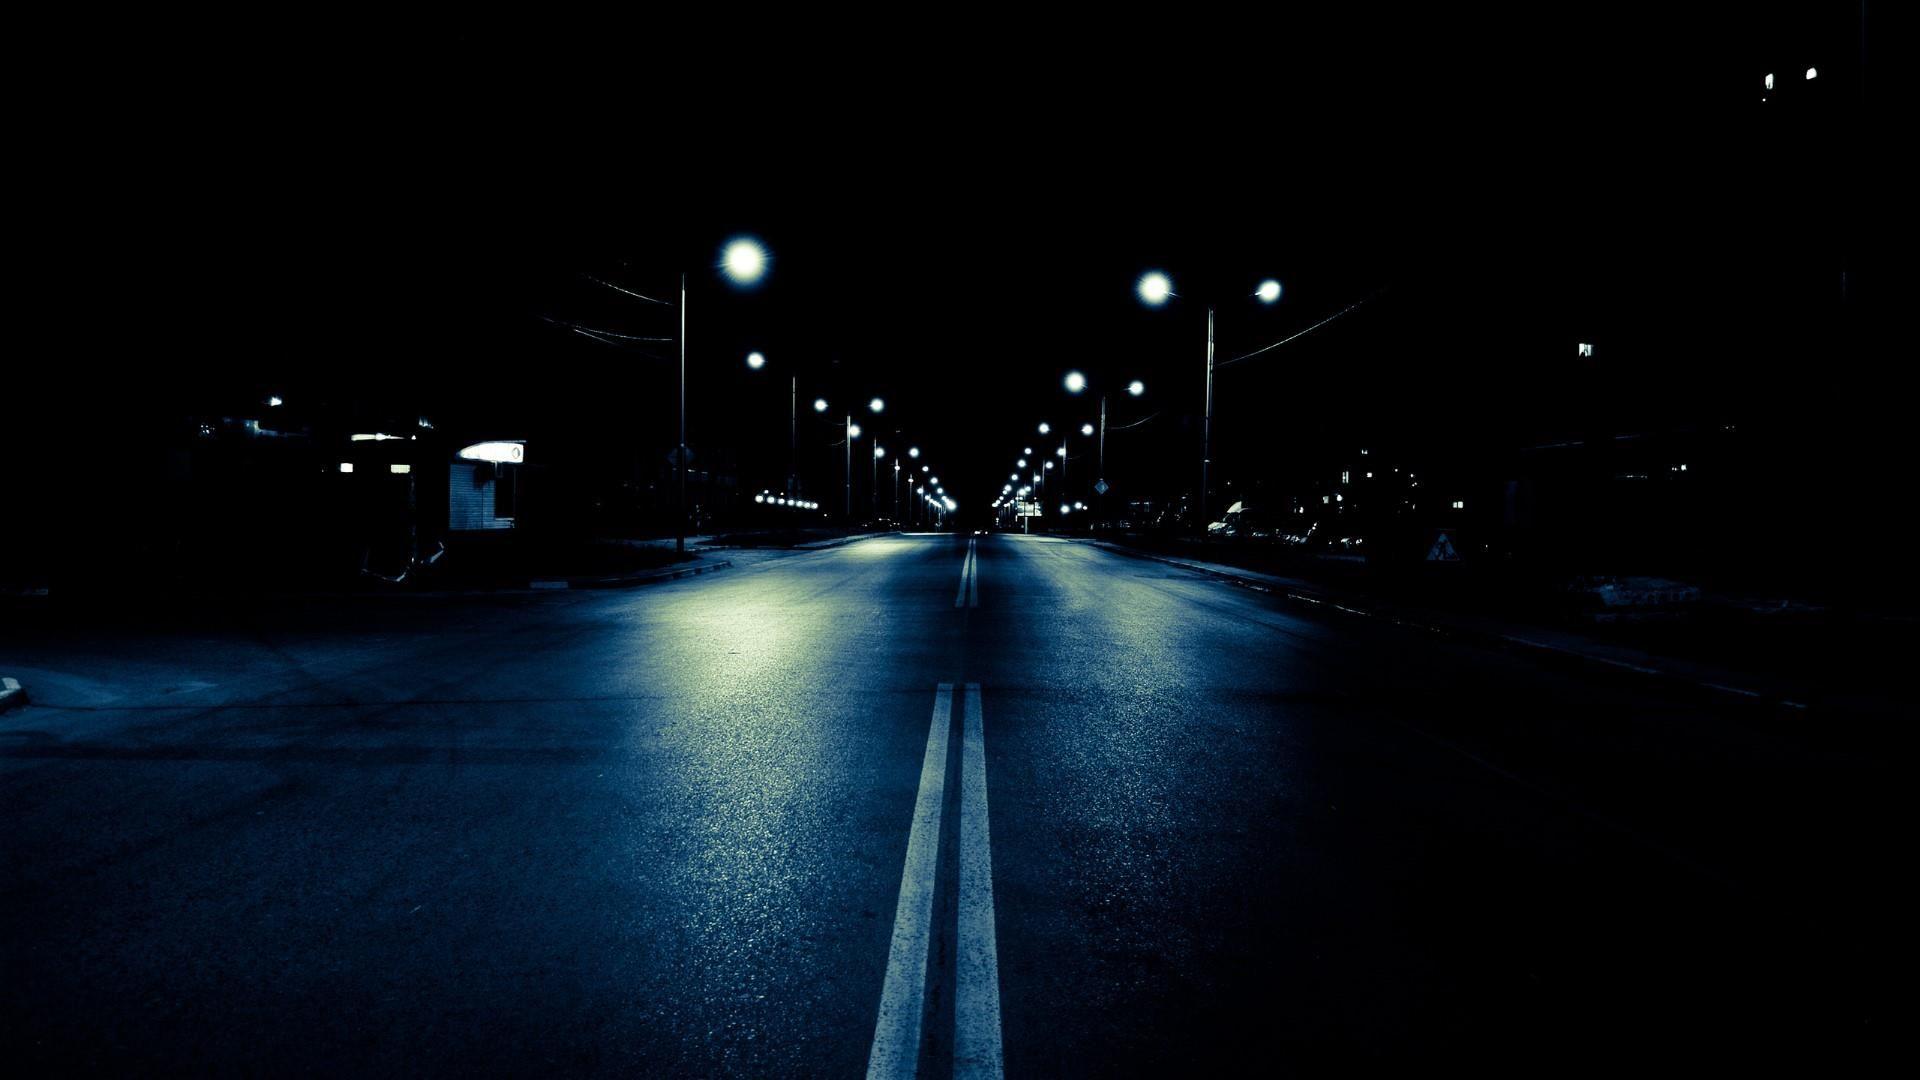 Wallpaper Hd City Night Street